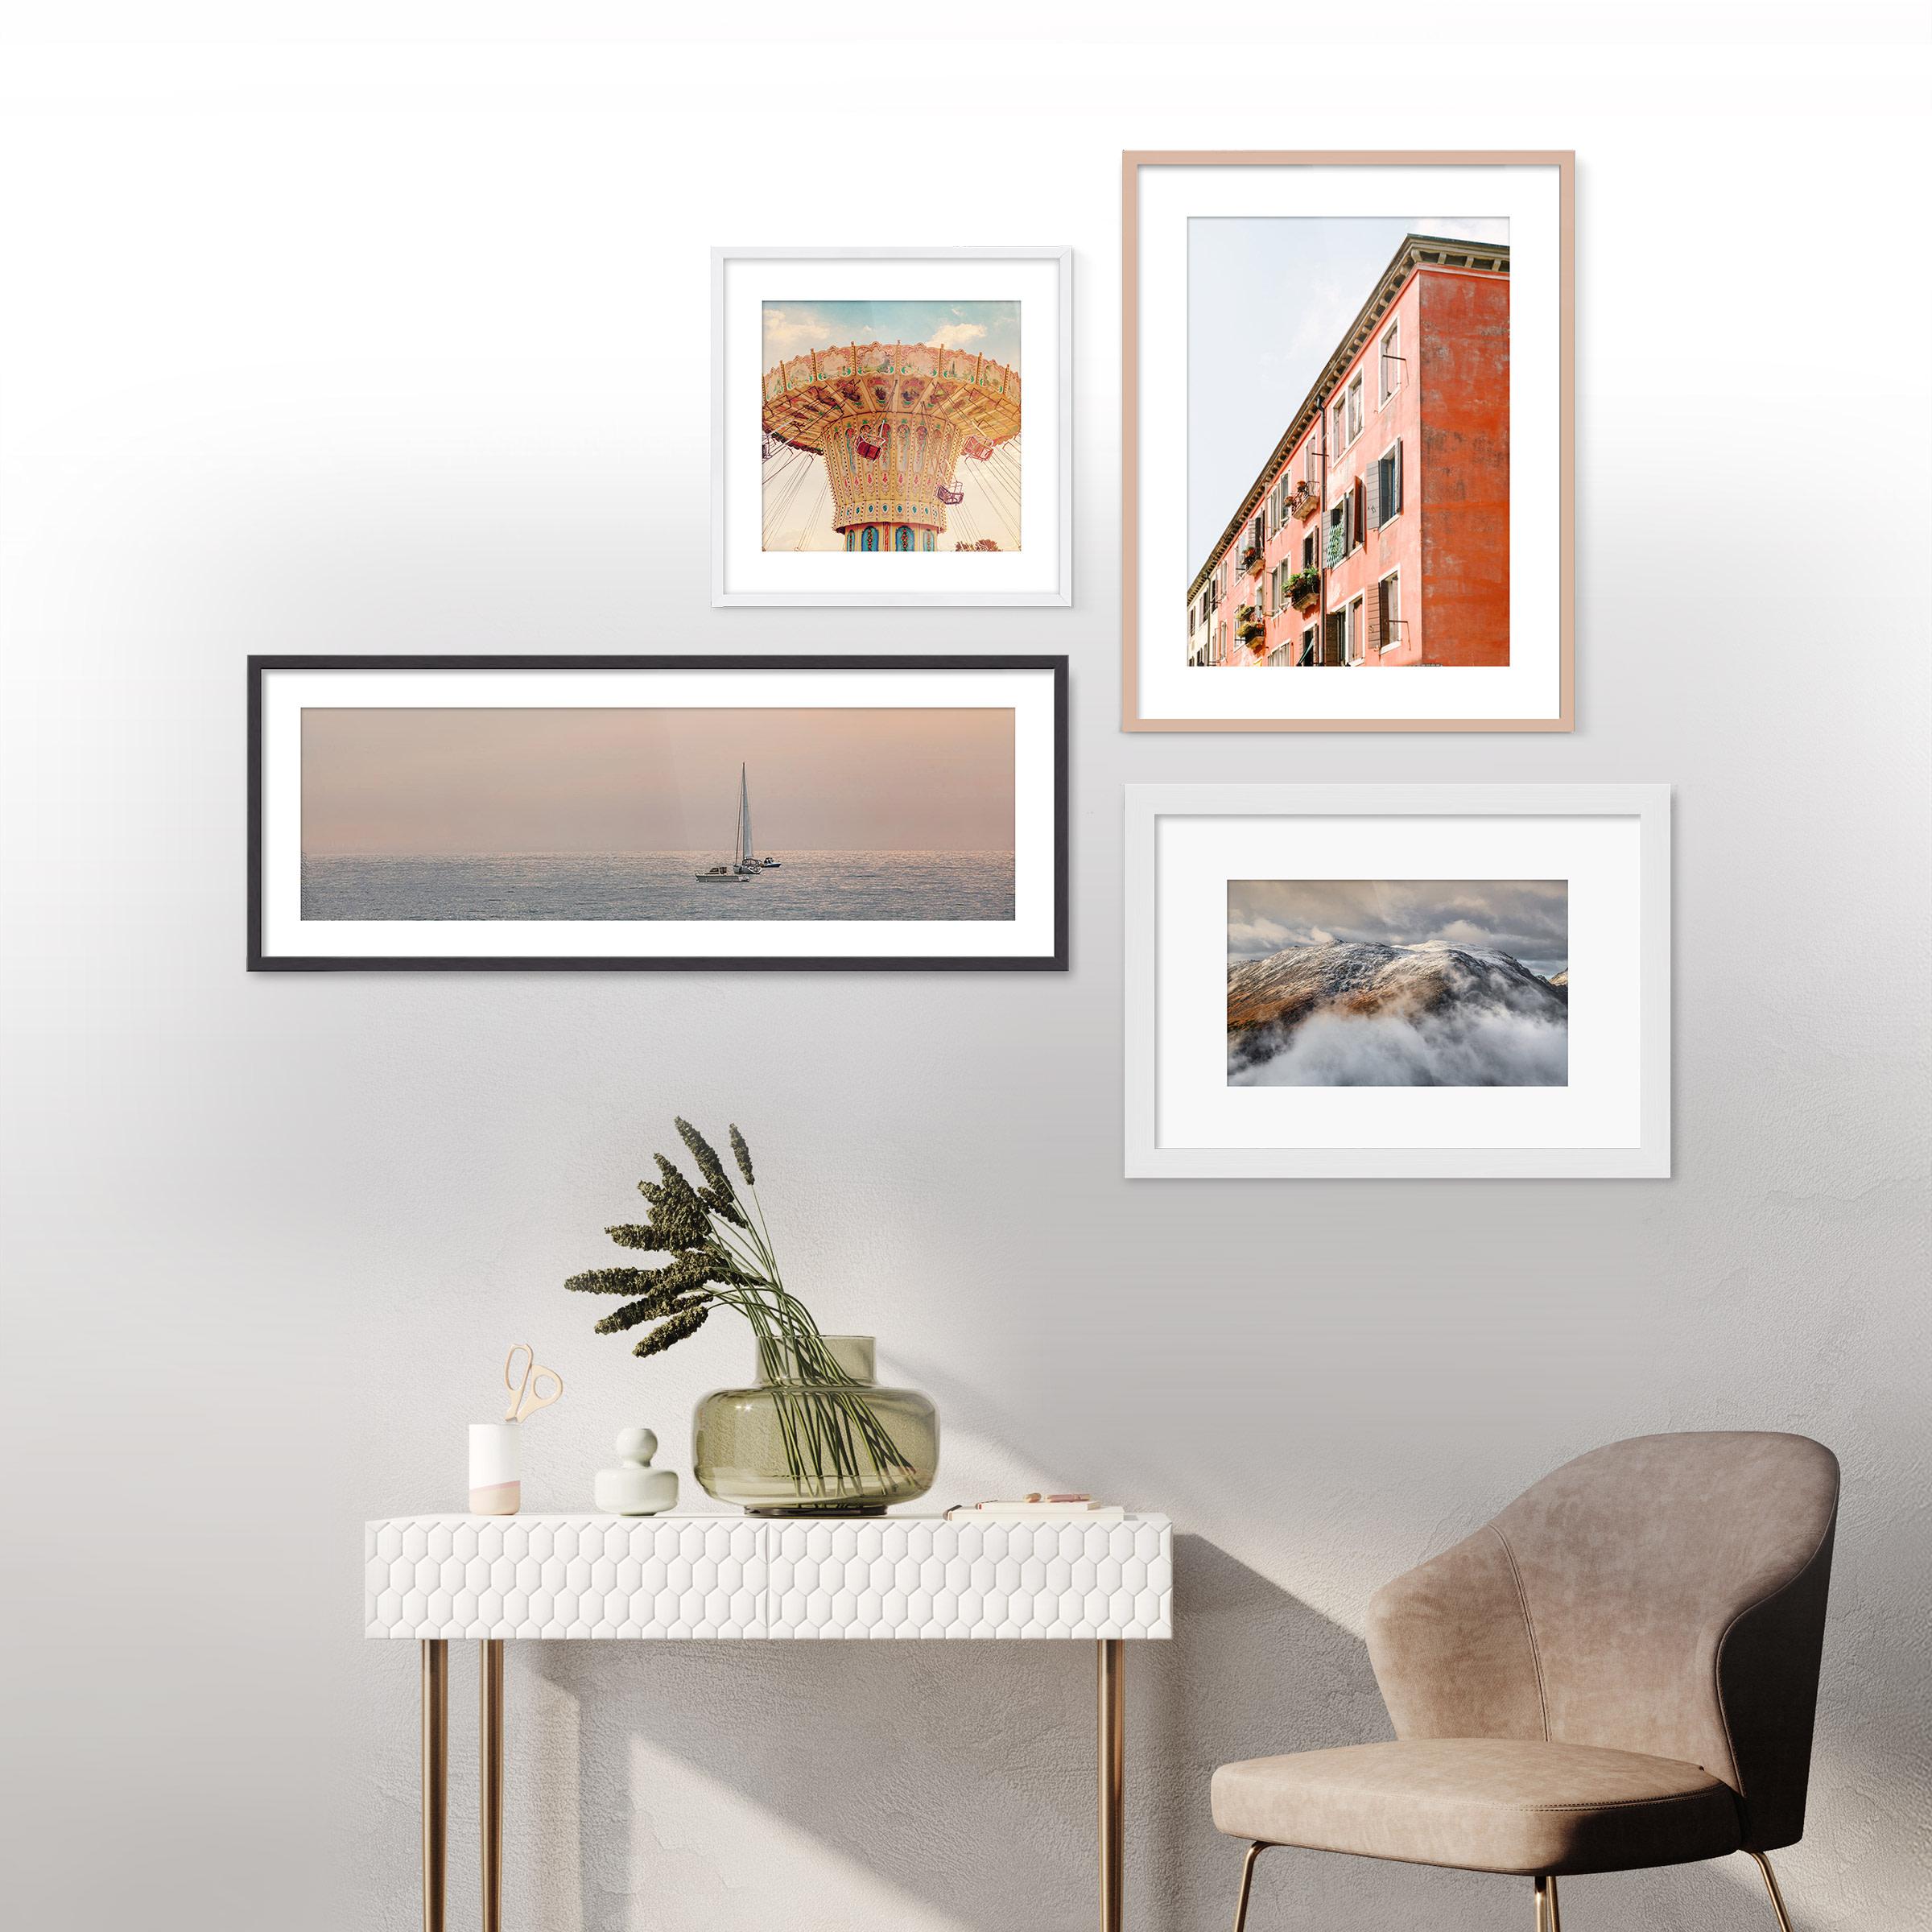 hahnemuehle-fineart-print-landschaft-inspiration-1200x1200.jpg